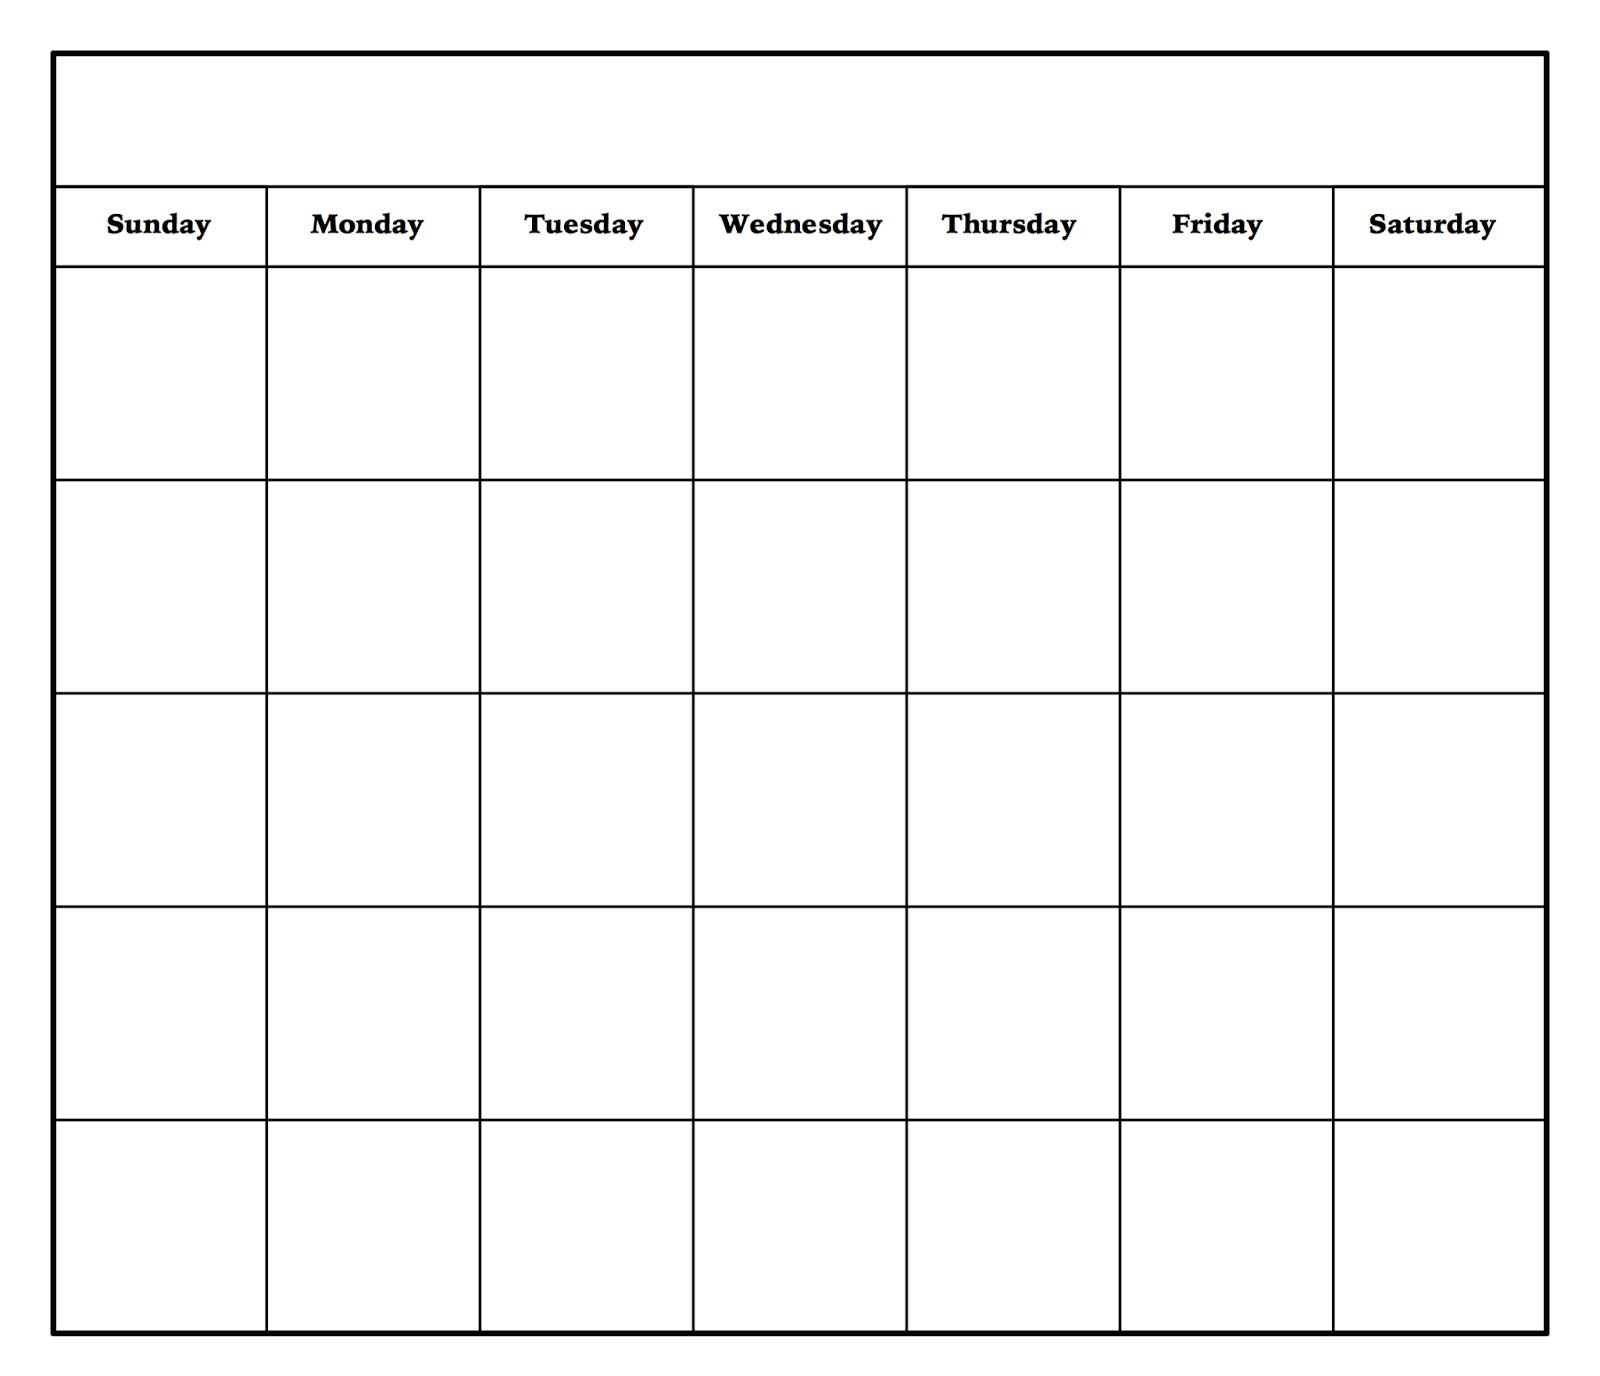 Monthly Calendar Template Excel Sheet | Printable Templates within Template For Calendar By Month